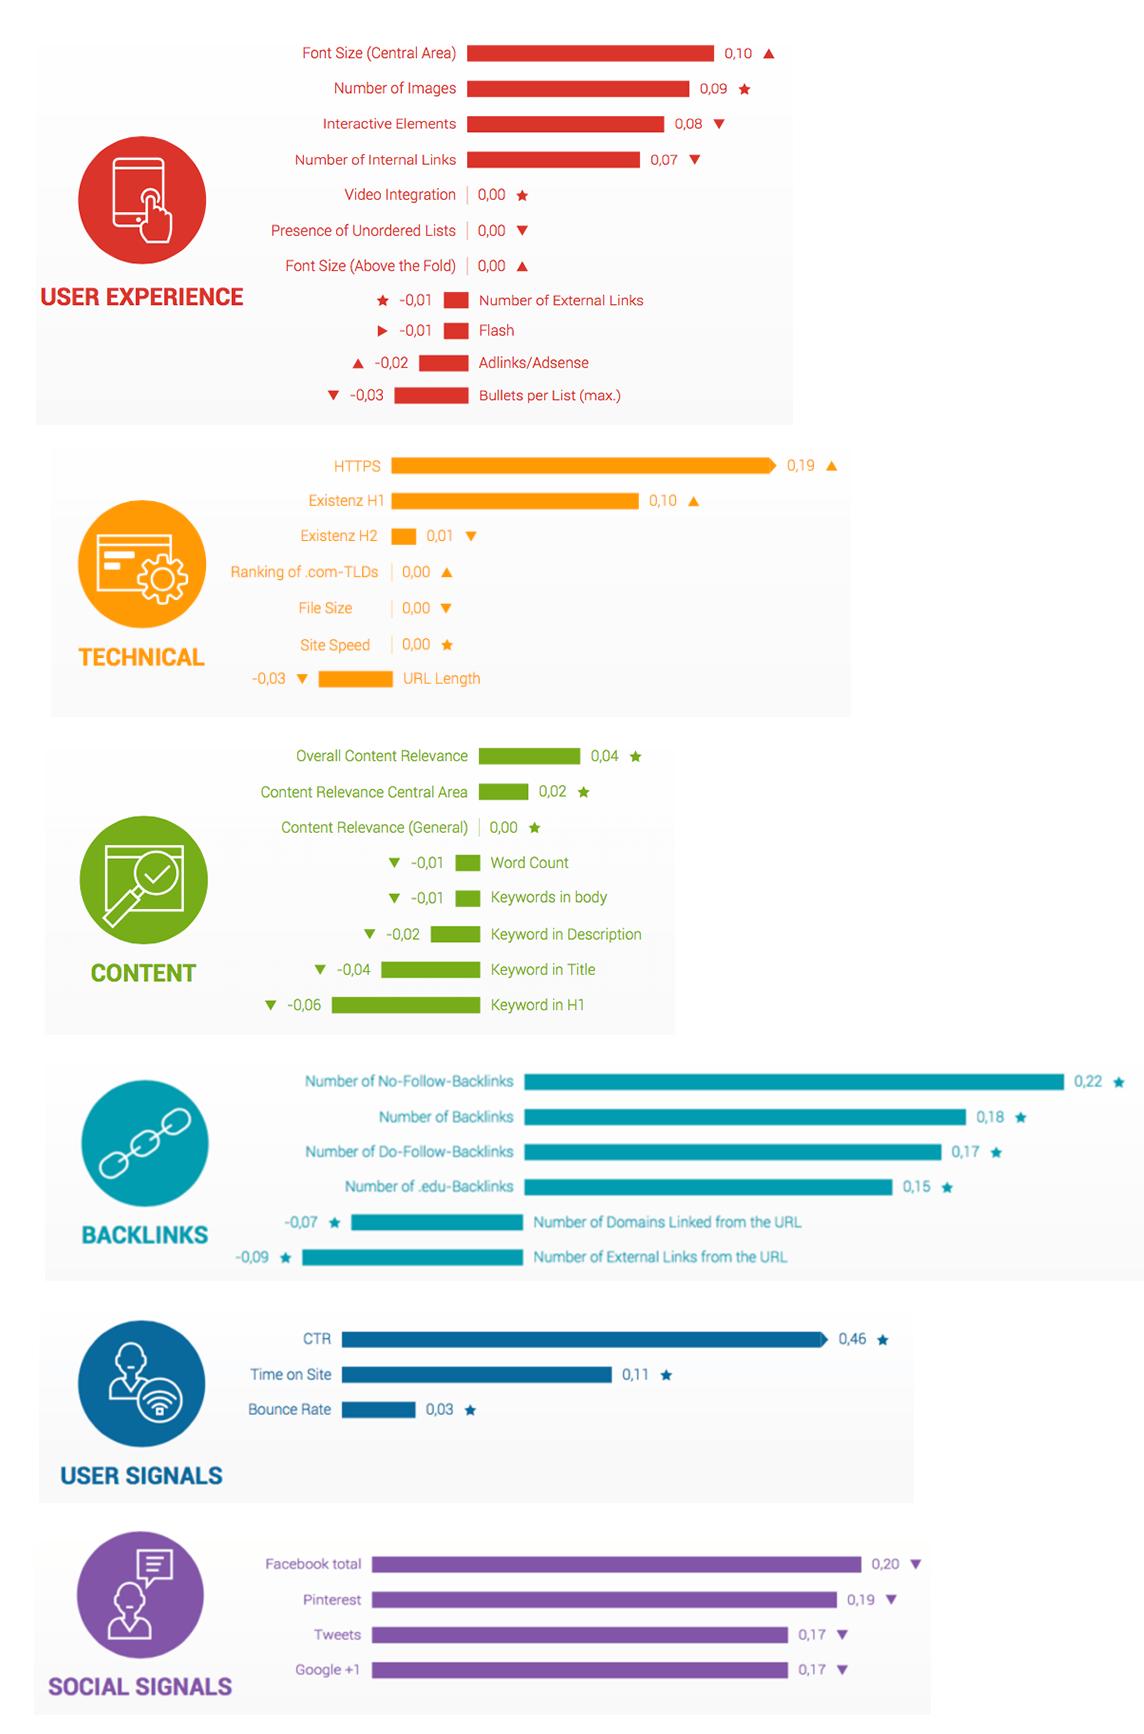 http://searchengineland.com/searchmetrics-google-ranking-factors-study-says-content-gaining-links-losing-importance-265431